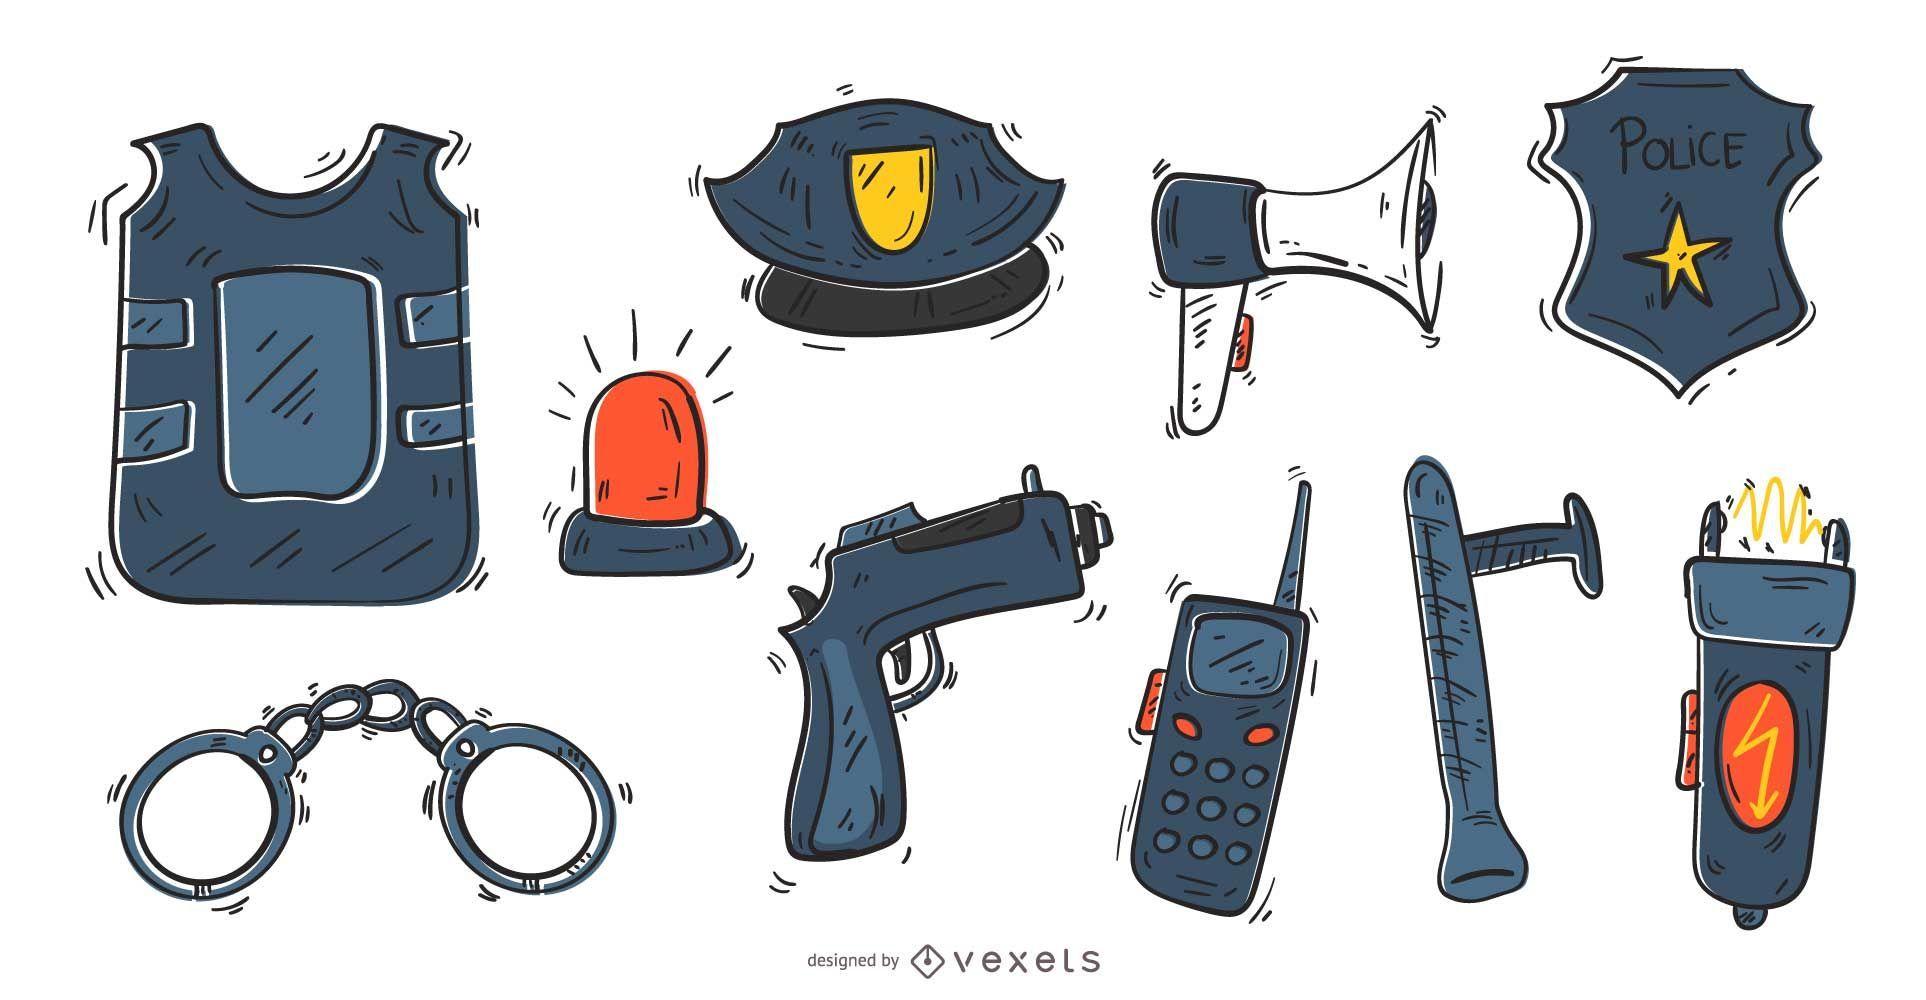 Police hand drawn icon set